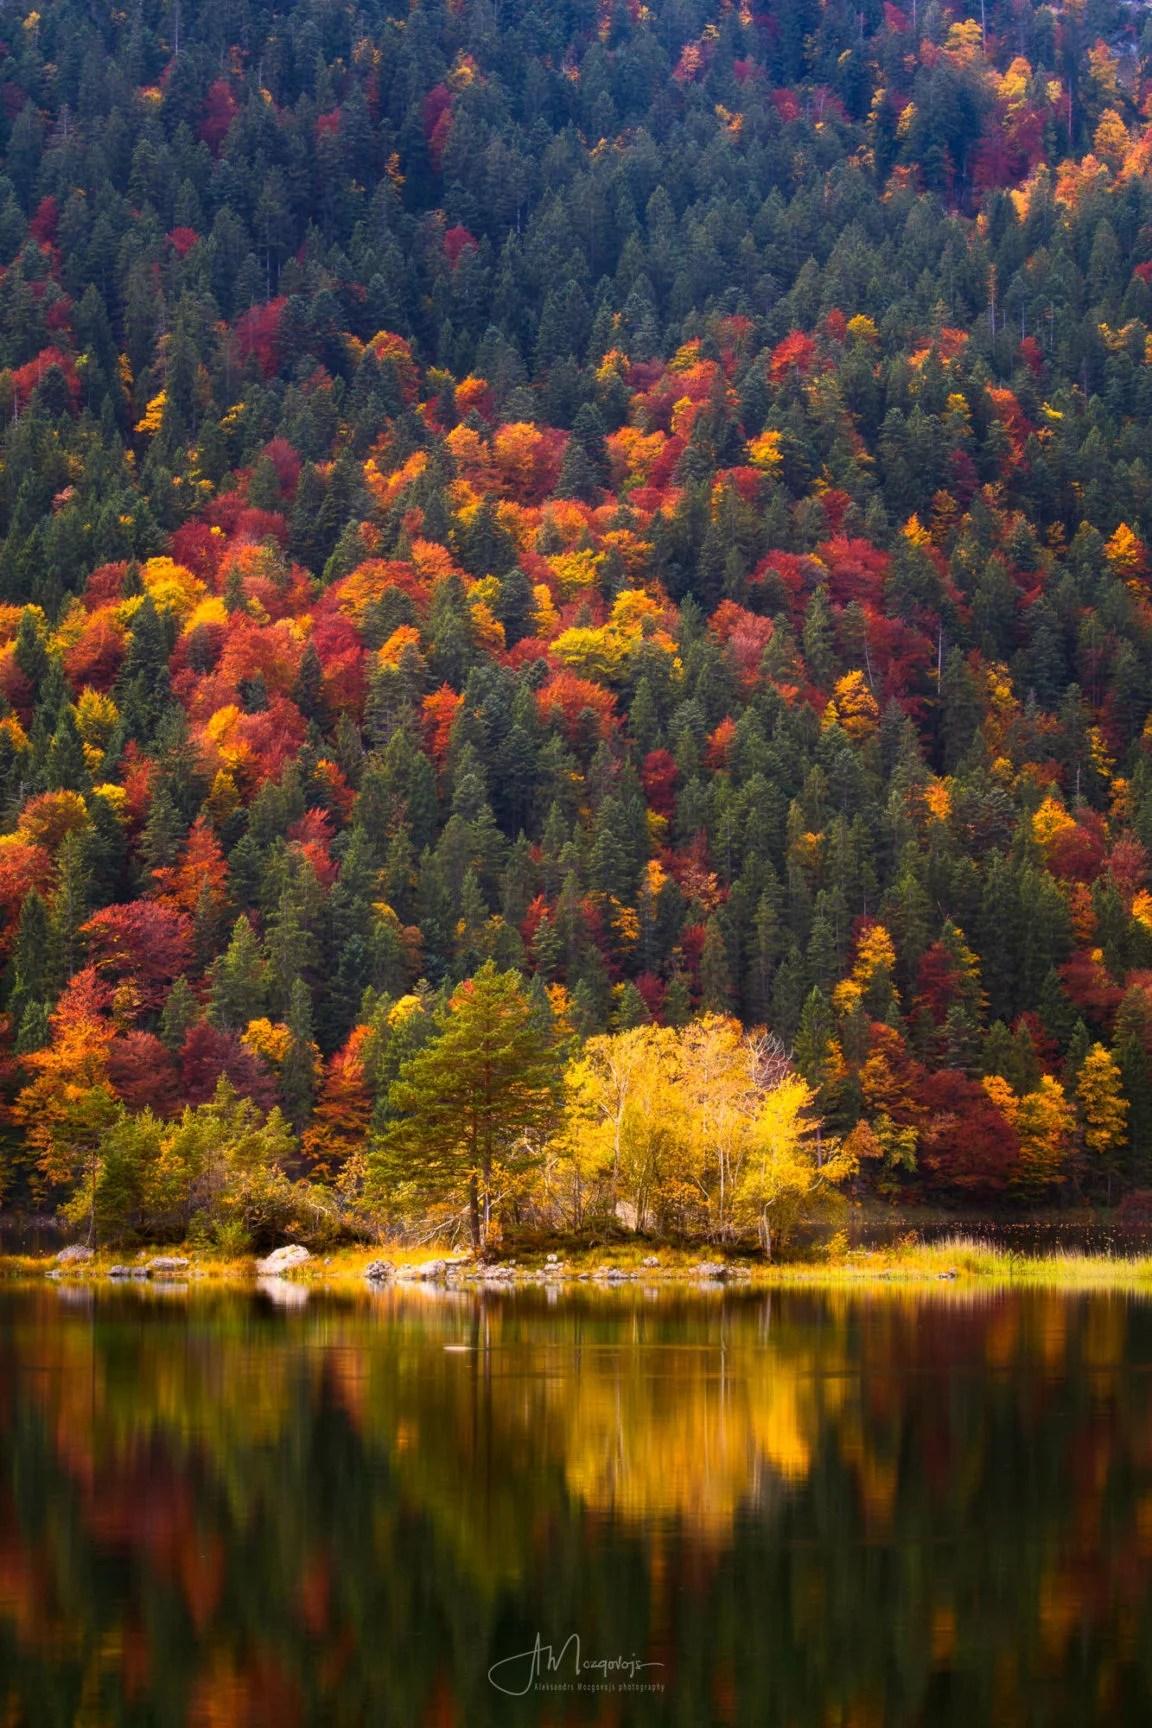 Autumn colors at Eibsee, Bavaria, Germany